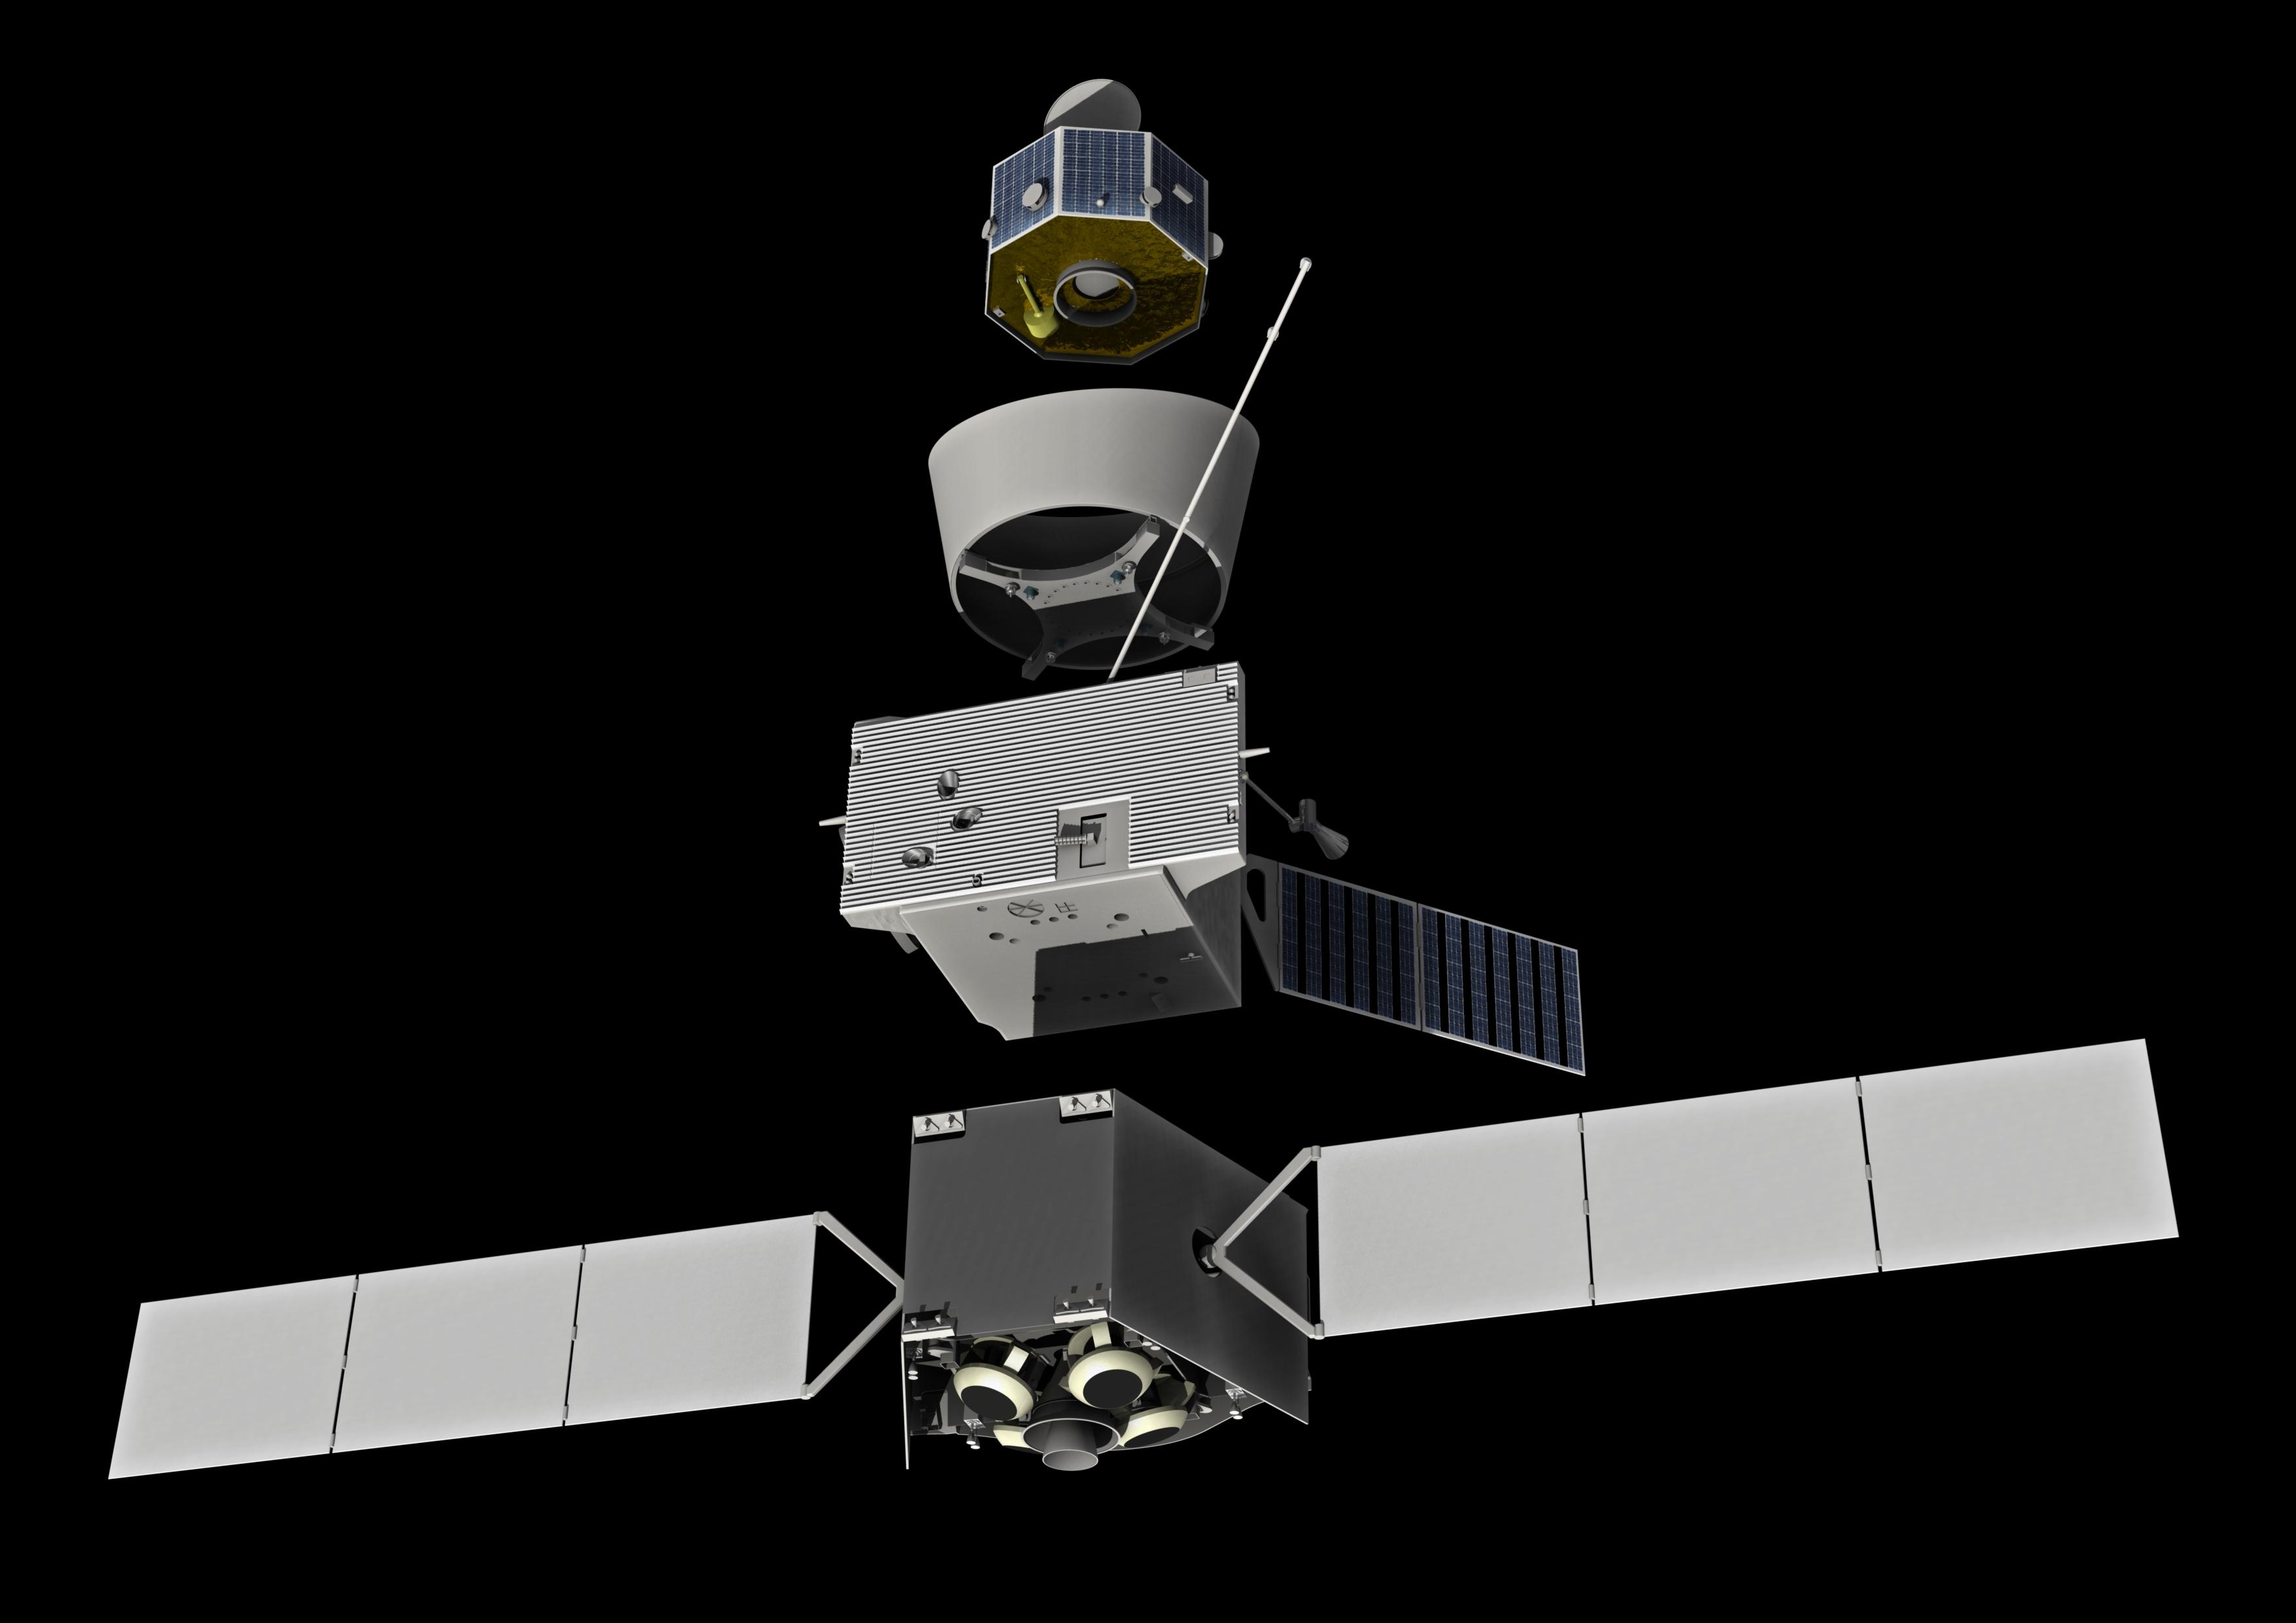 messenger spacecraft launch date - HD3508×2480